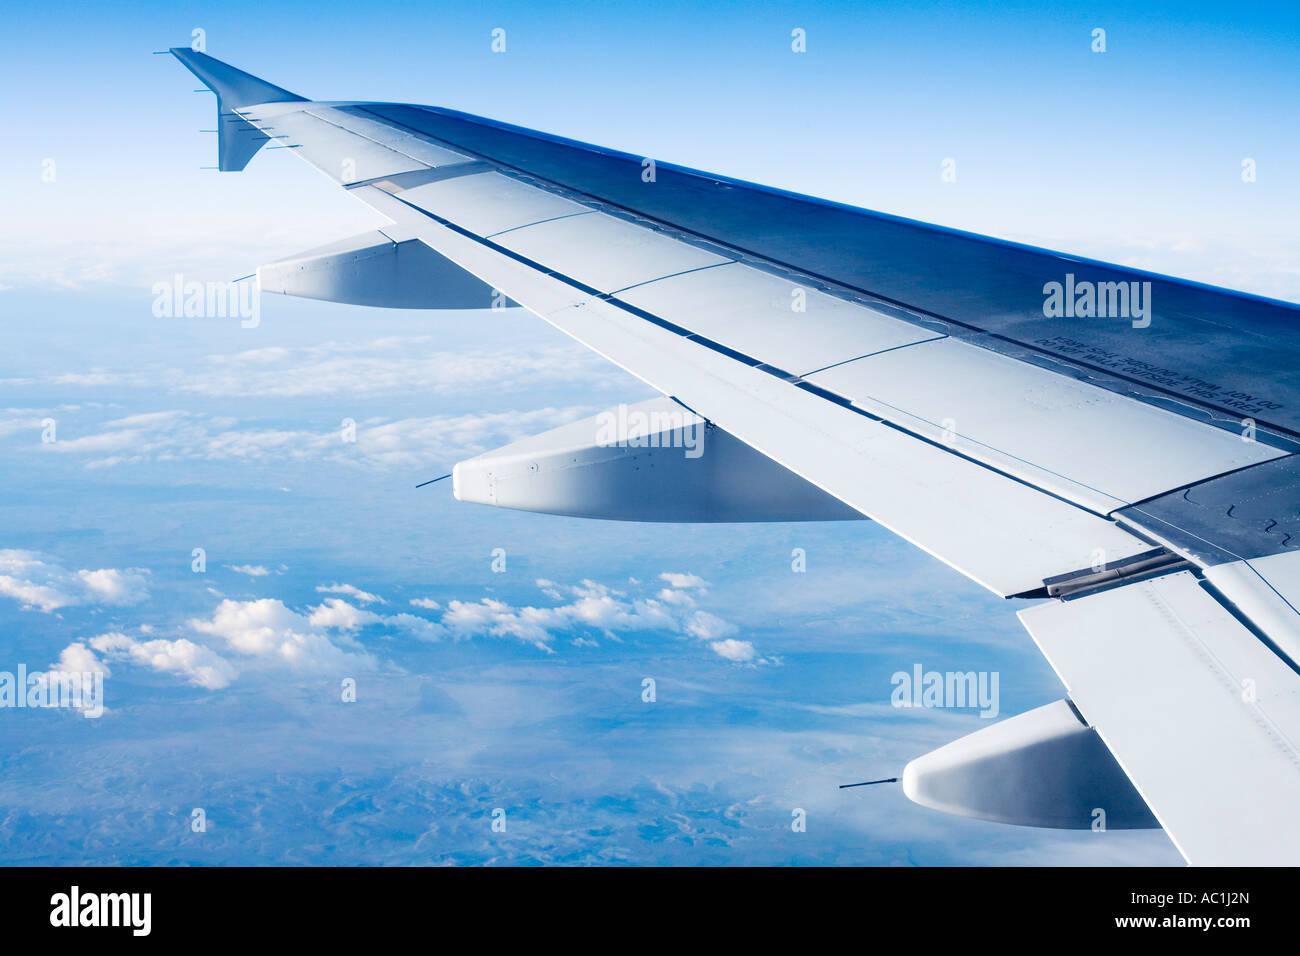 Aerofoil - Stock Image